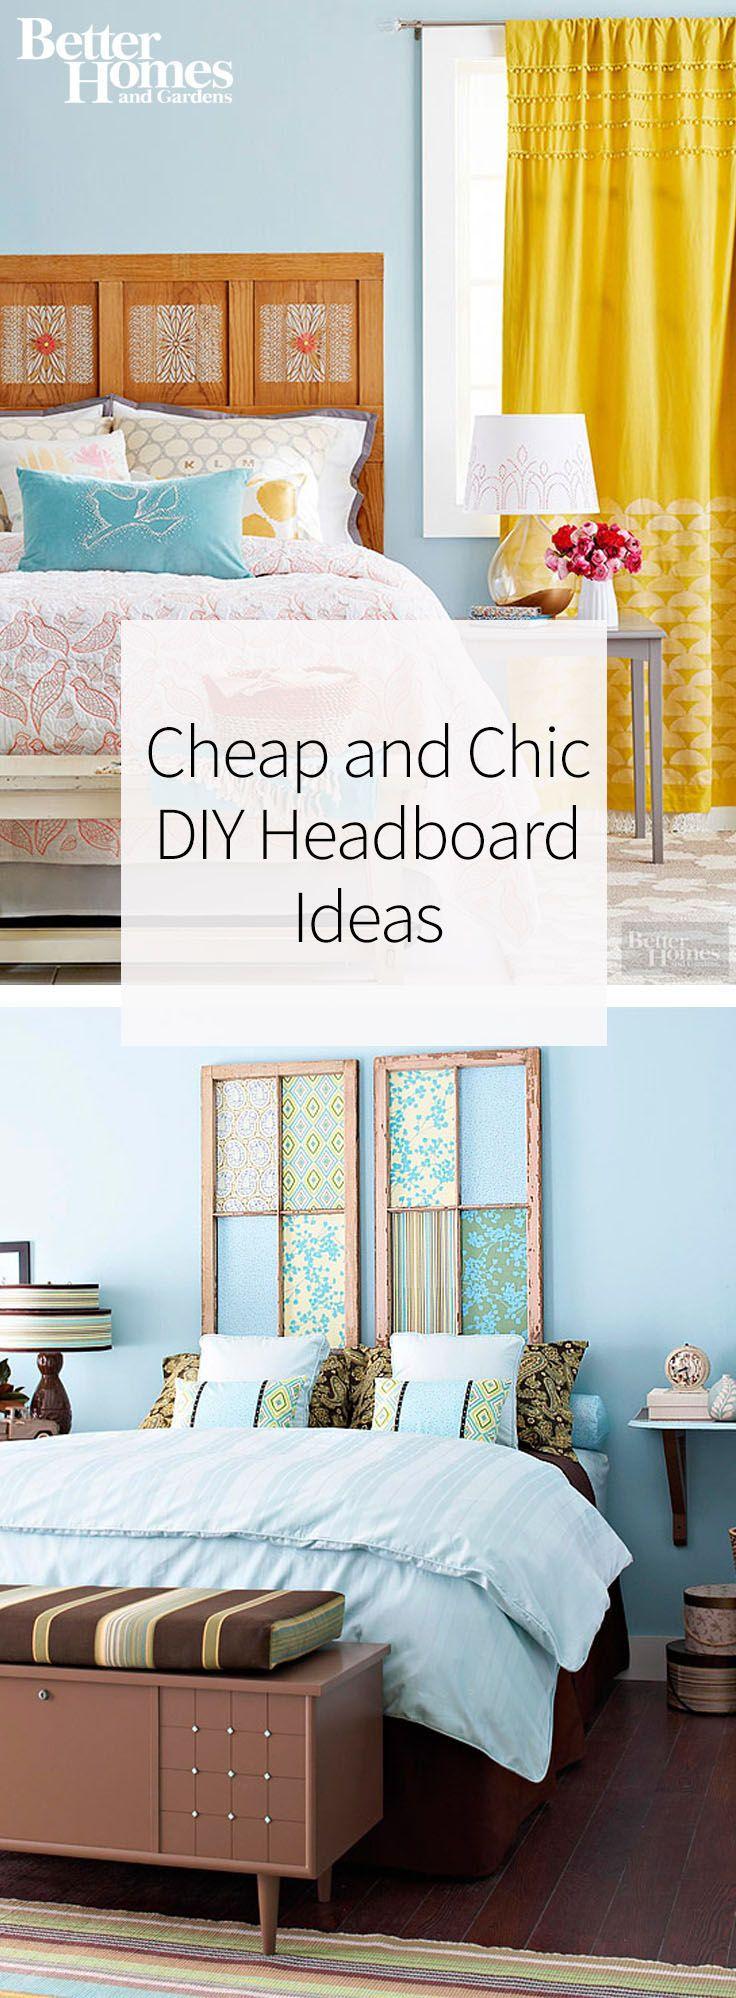 Cheap And Chic Diy Headboard Ideas Pinterest Diy